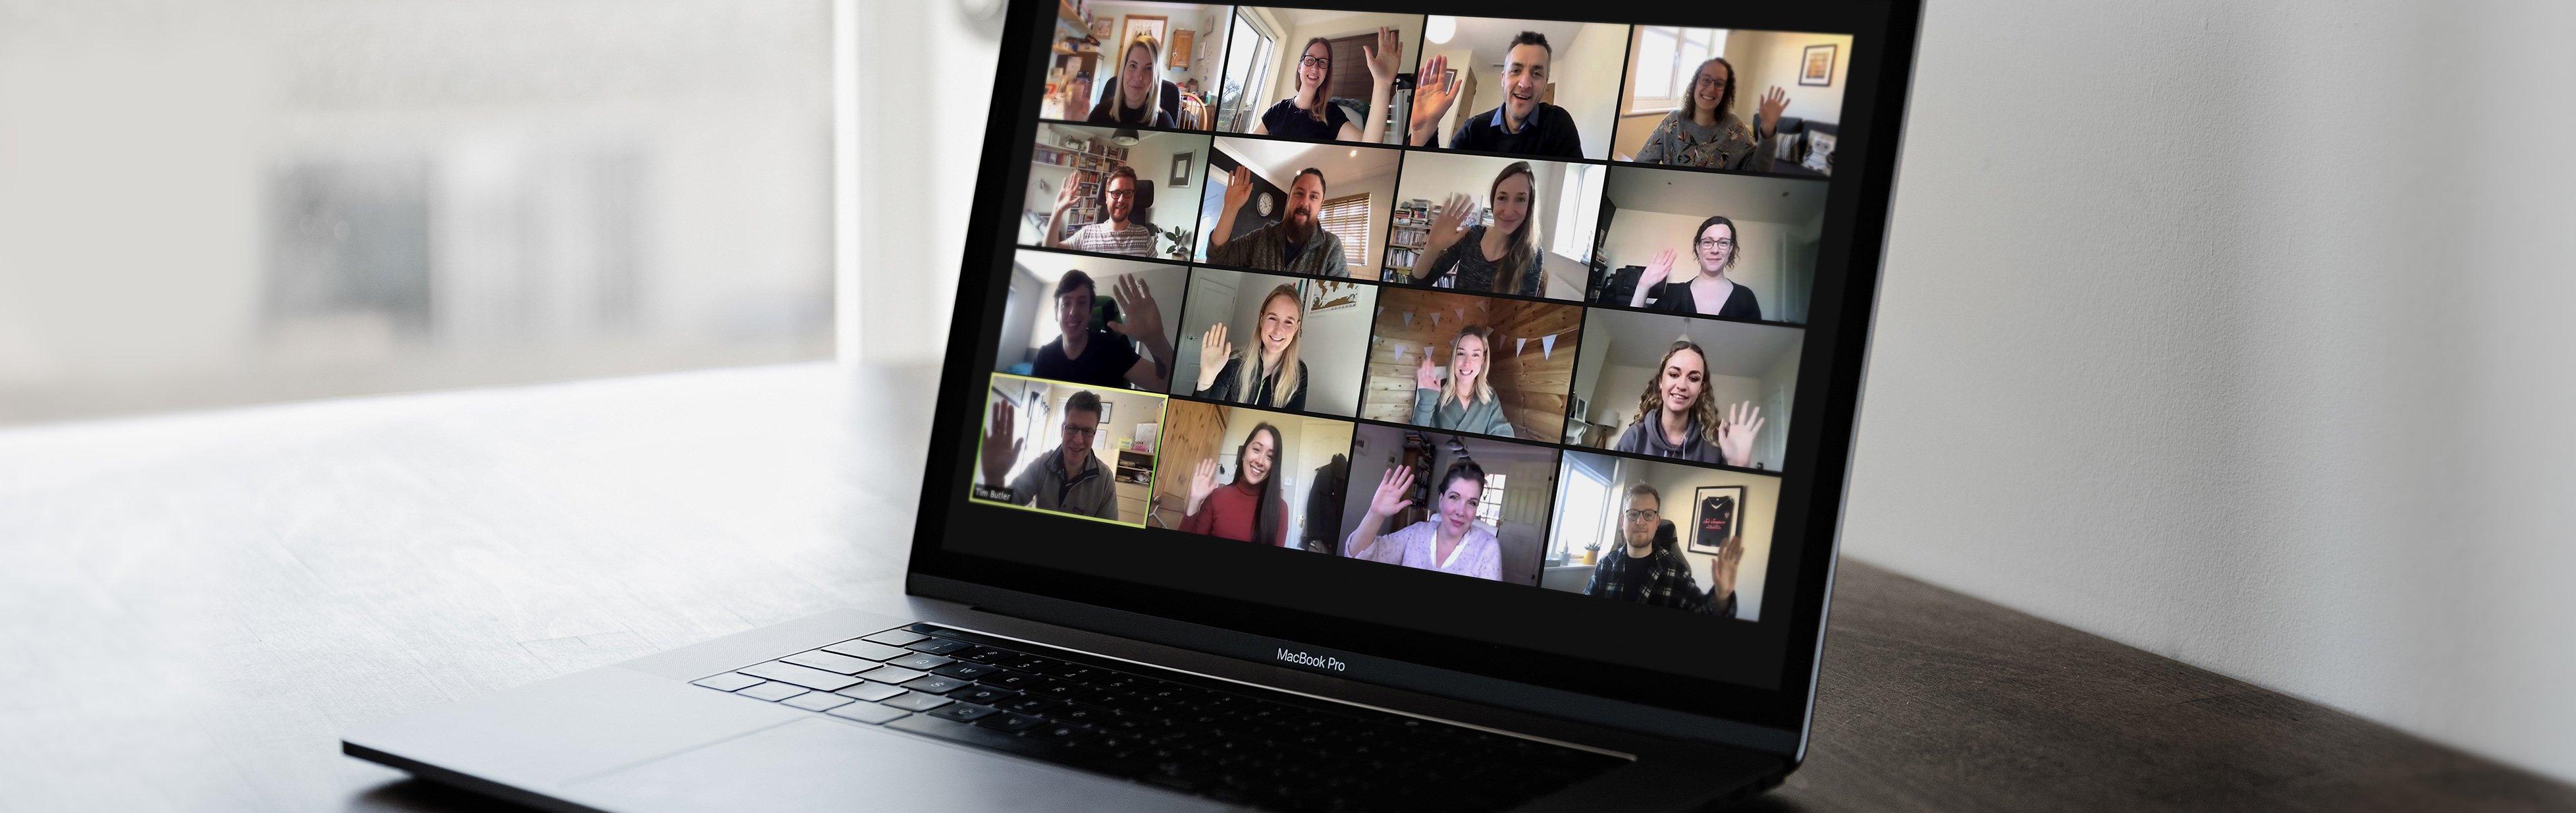 Innovation Visual Digital Marketing Team Zoom on screen